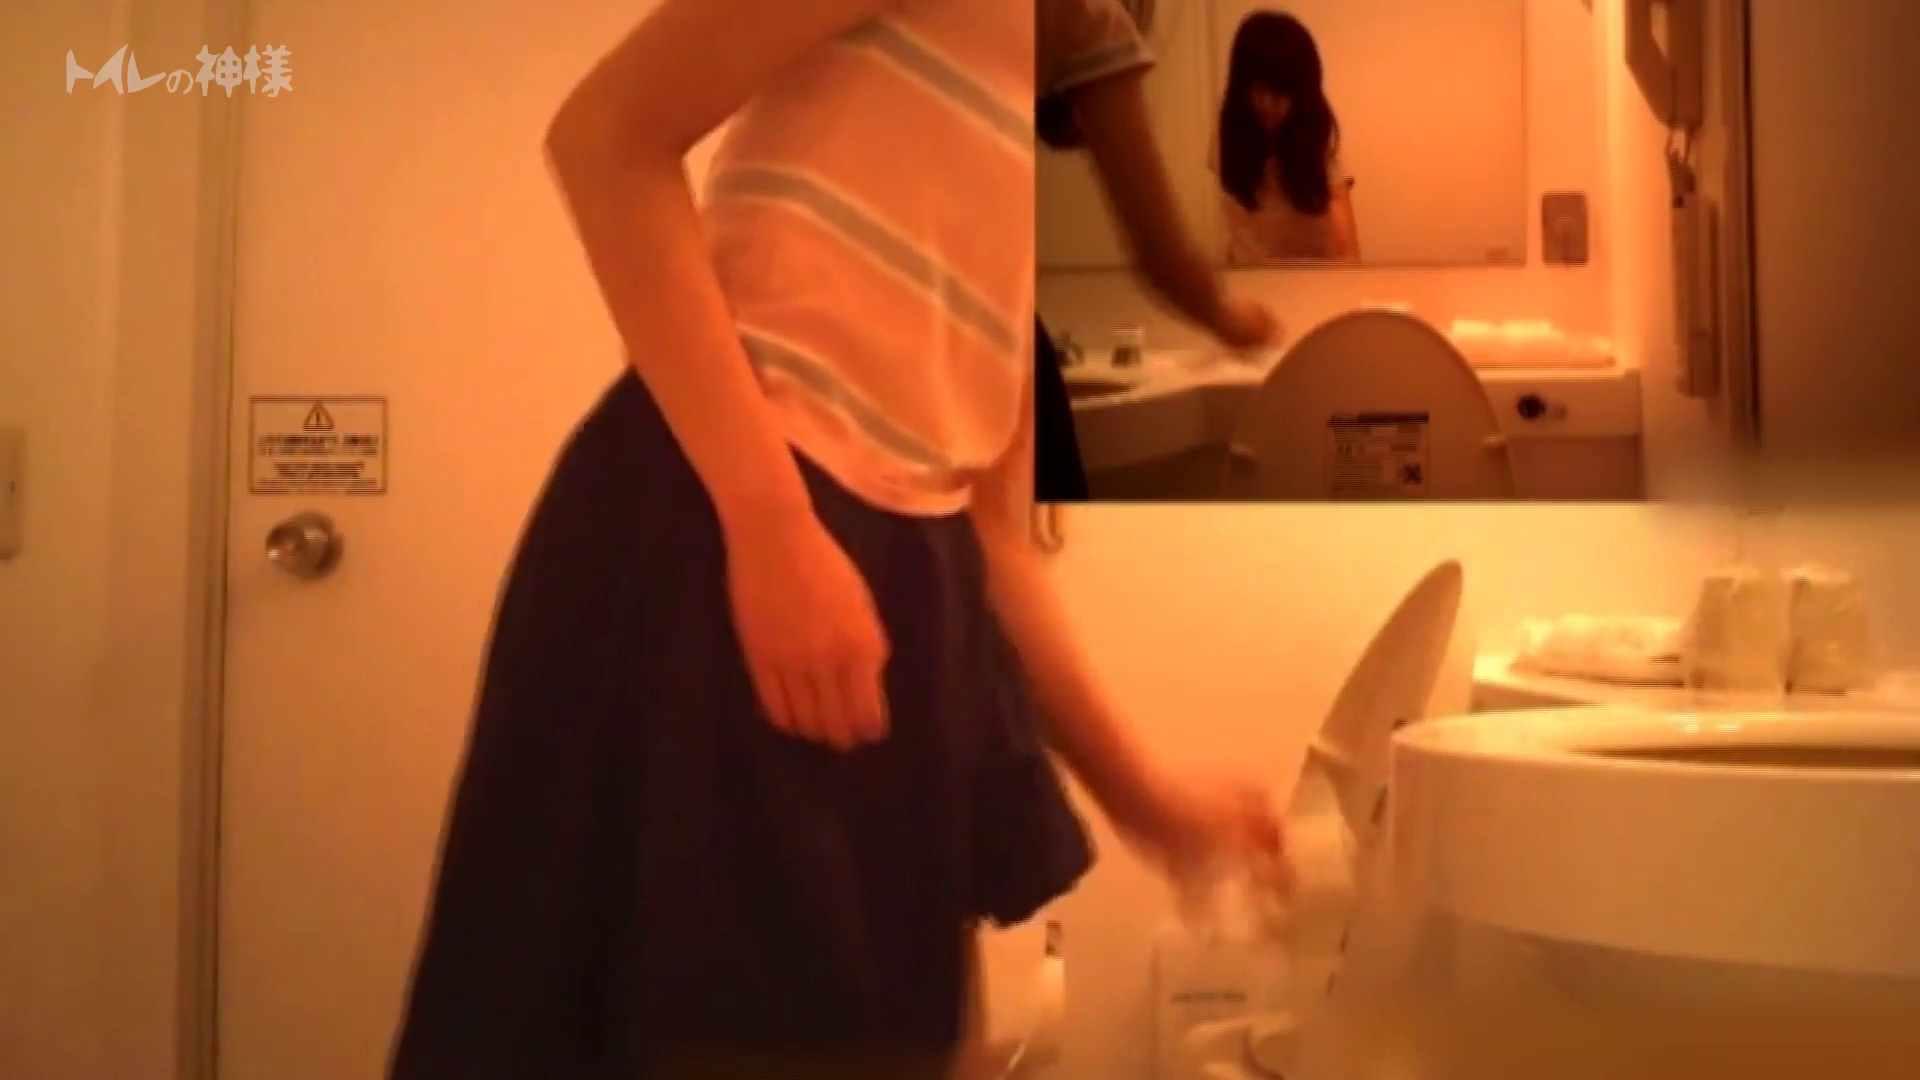 Vol.04 女子大生のトイレ恥態 OLハメ撮り  104Pix 75